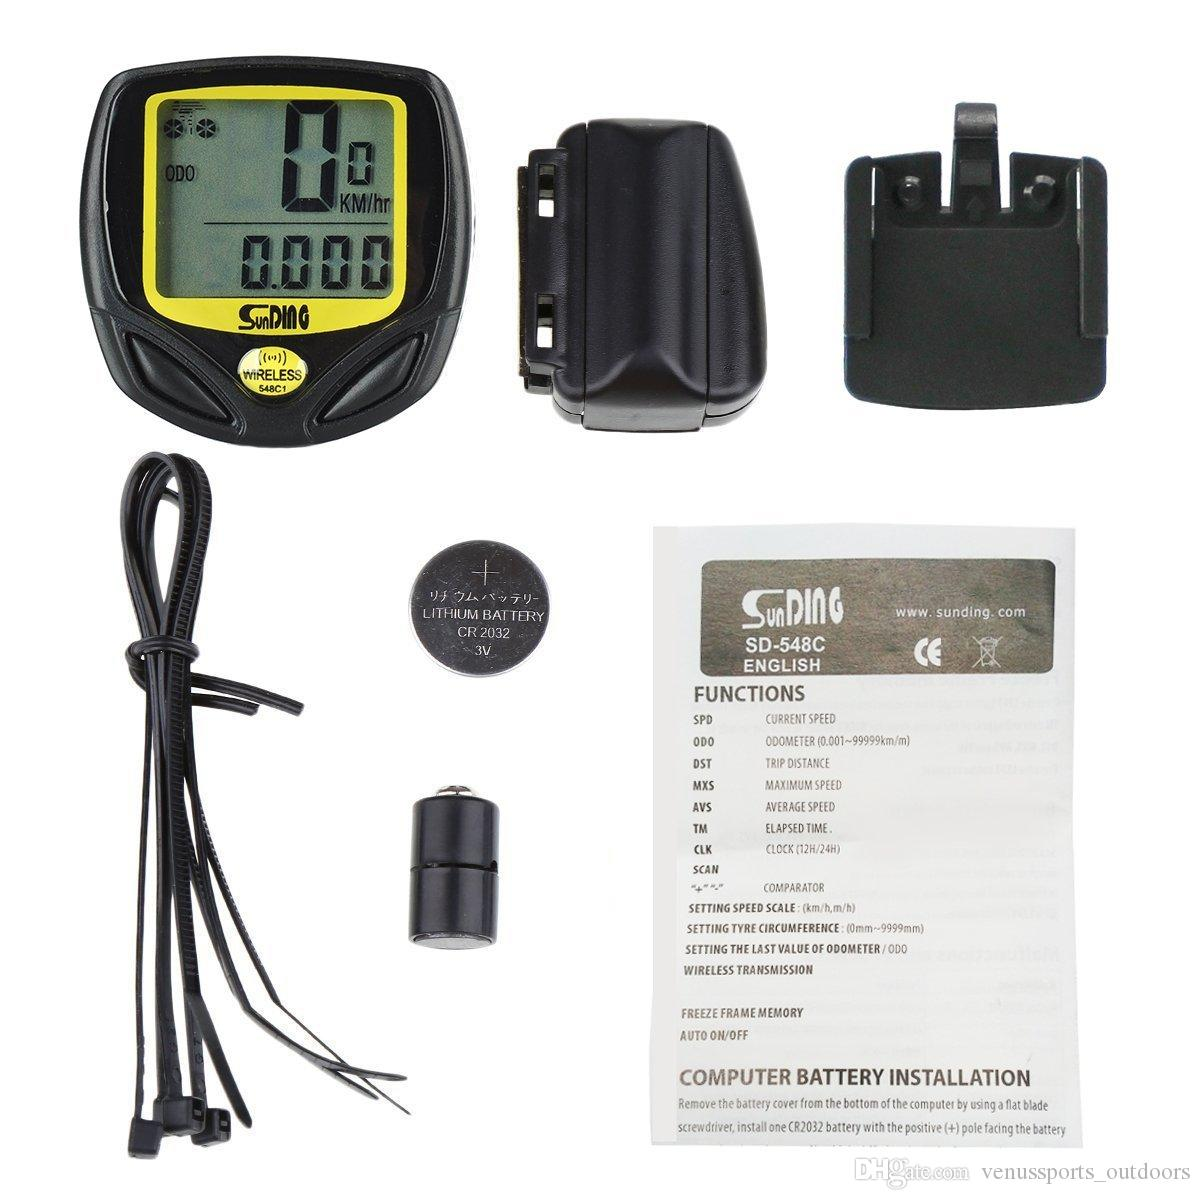 Outdoor MTB Bicycle Cycling Bike Computer LCD Display Waterproof Wireless Speedometer New Arrival Odometer Meter outdoor sports bike